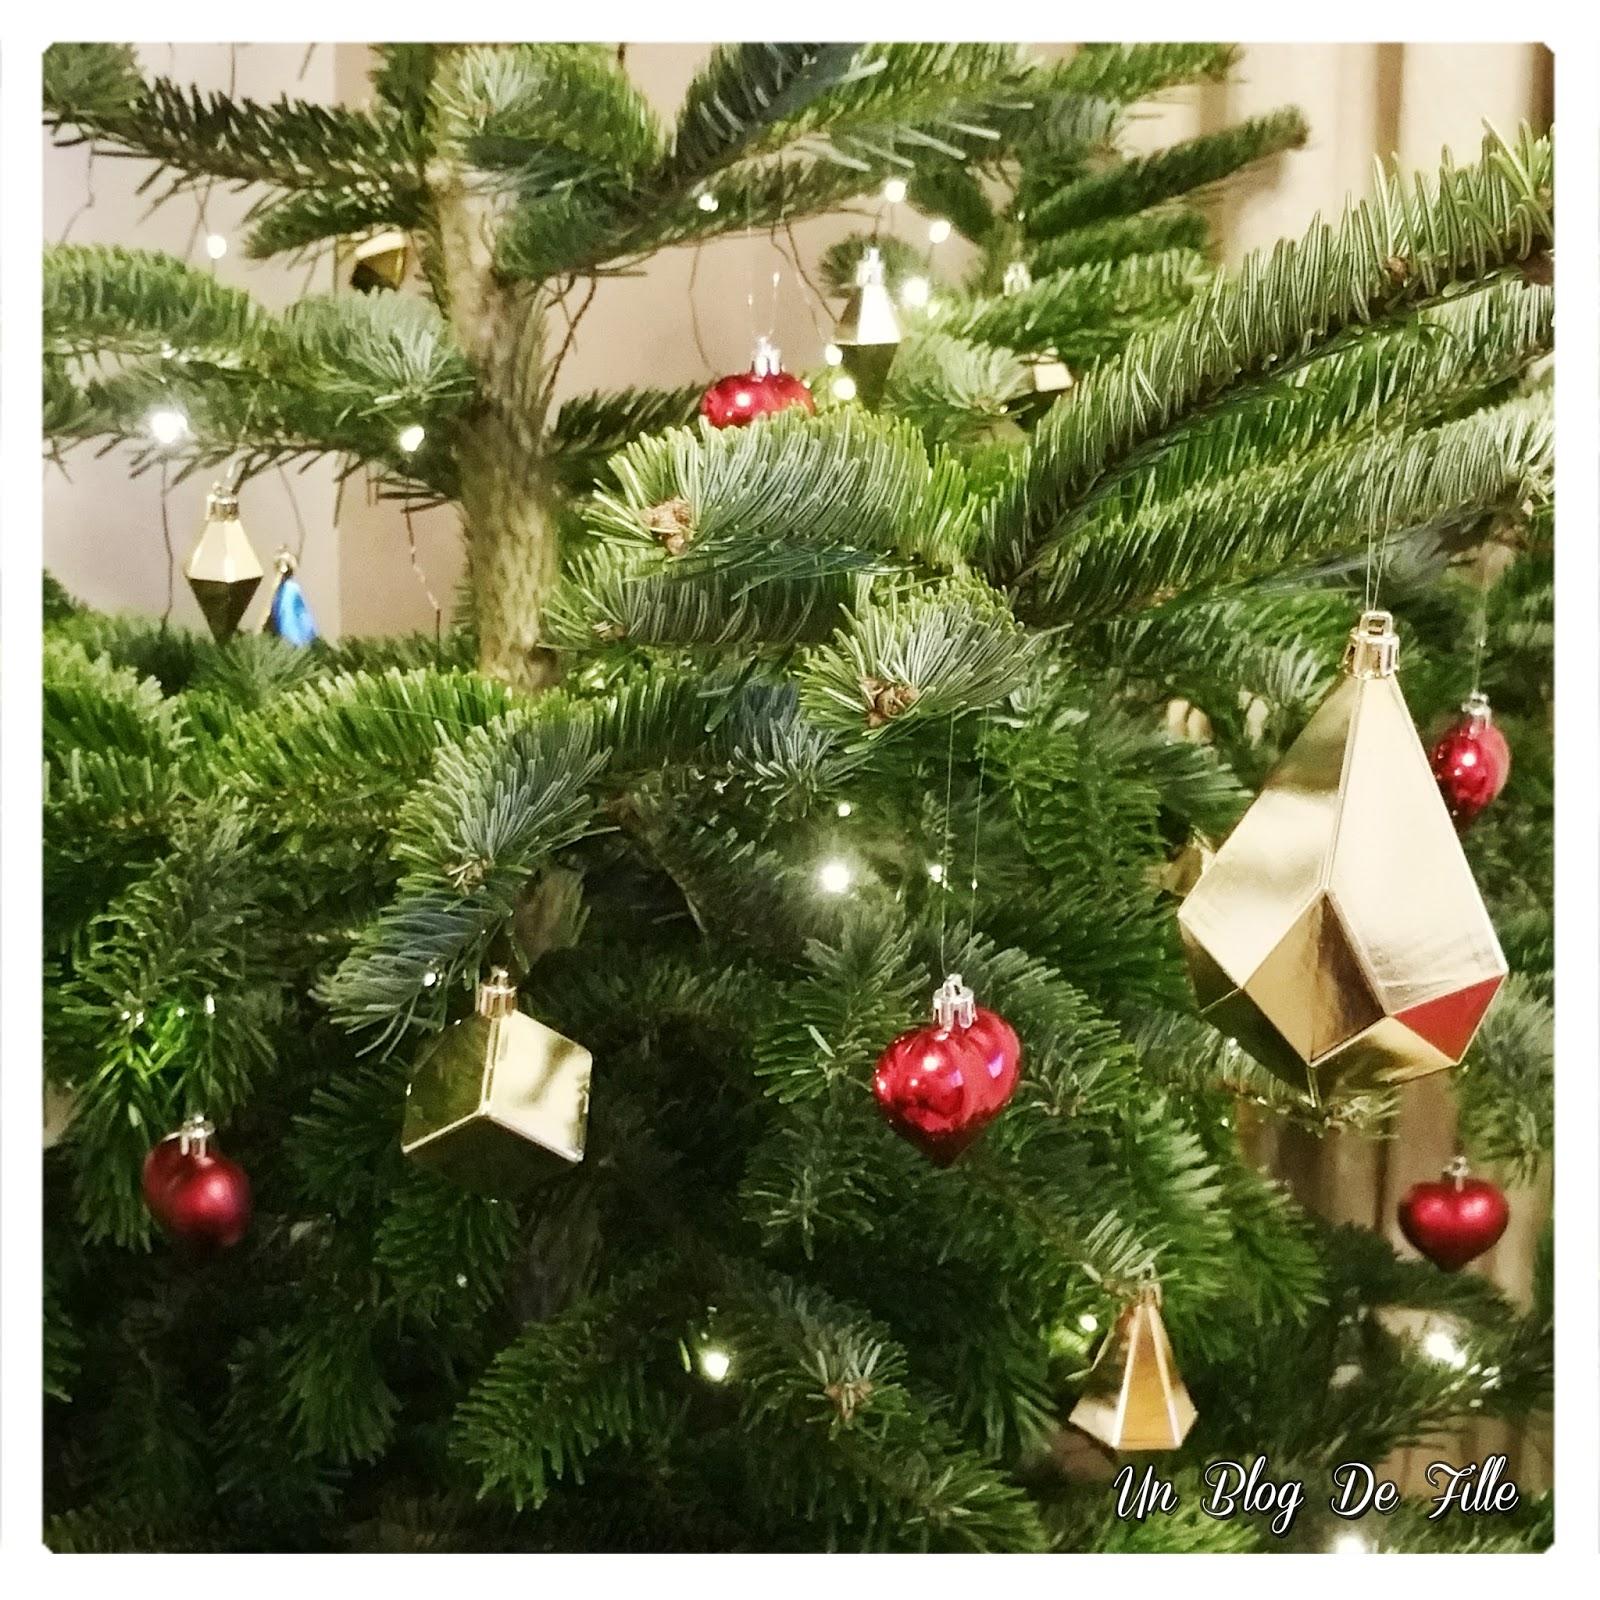 http://unblogdefille.blogspot.fr/2017/12/decoration-sapin-de-noel-moderne-et.html